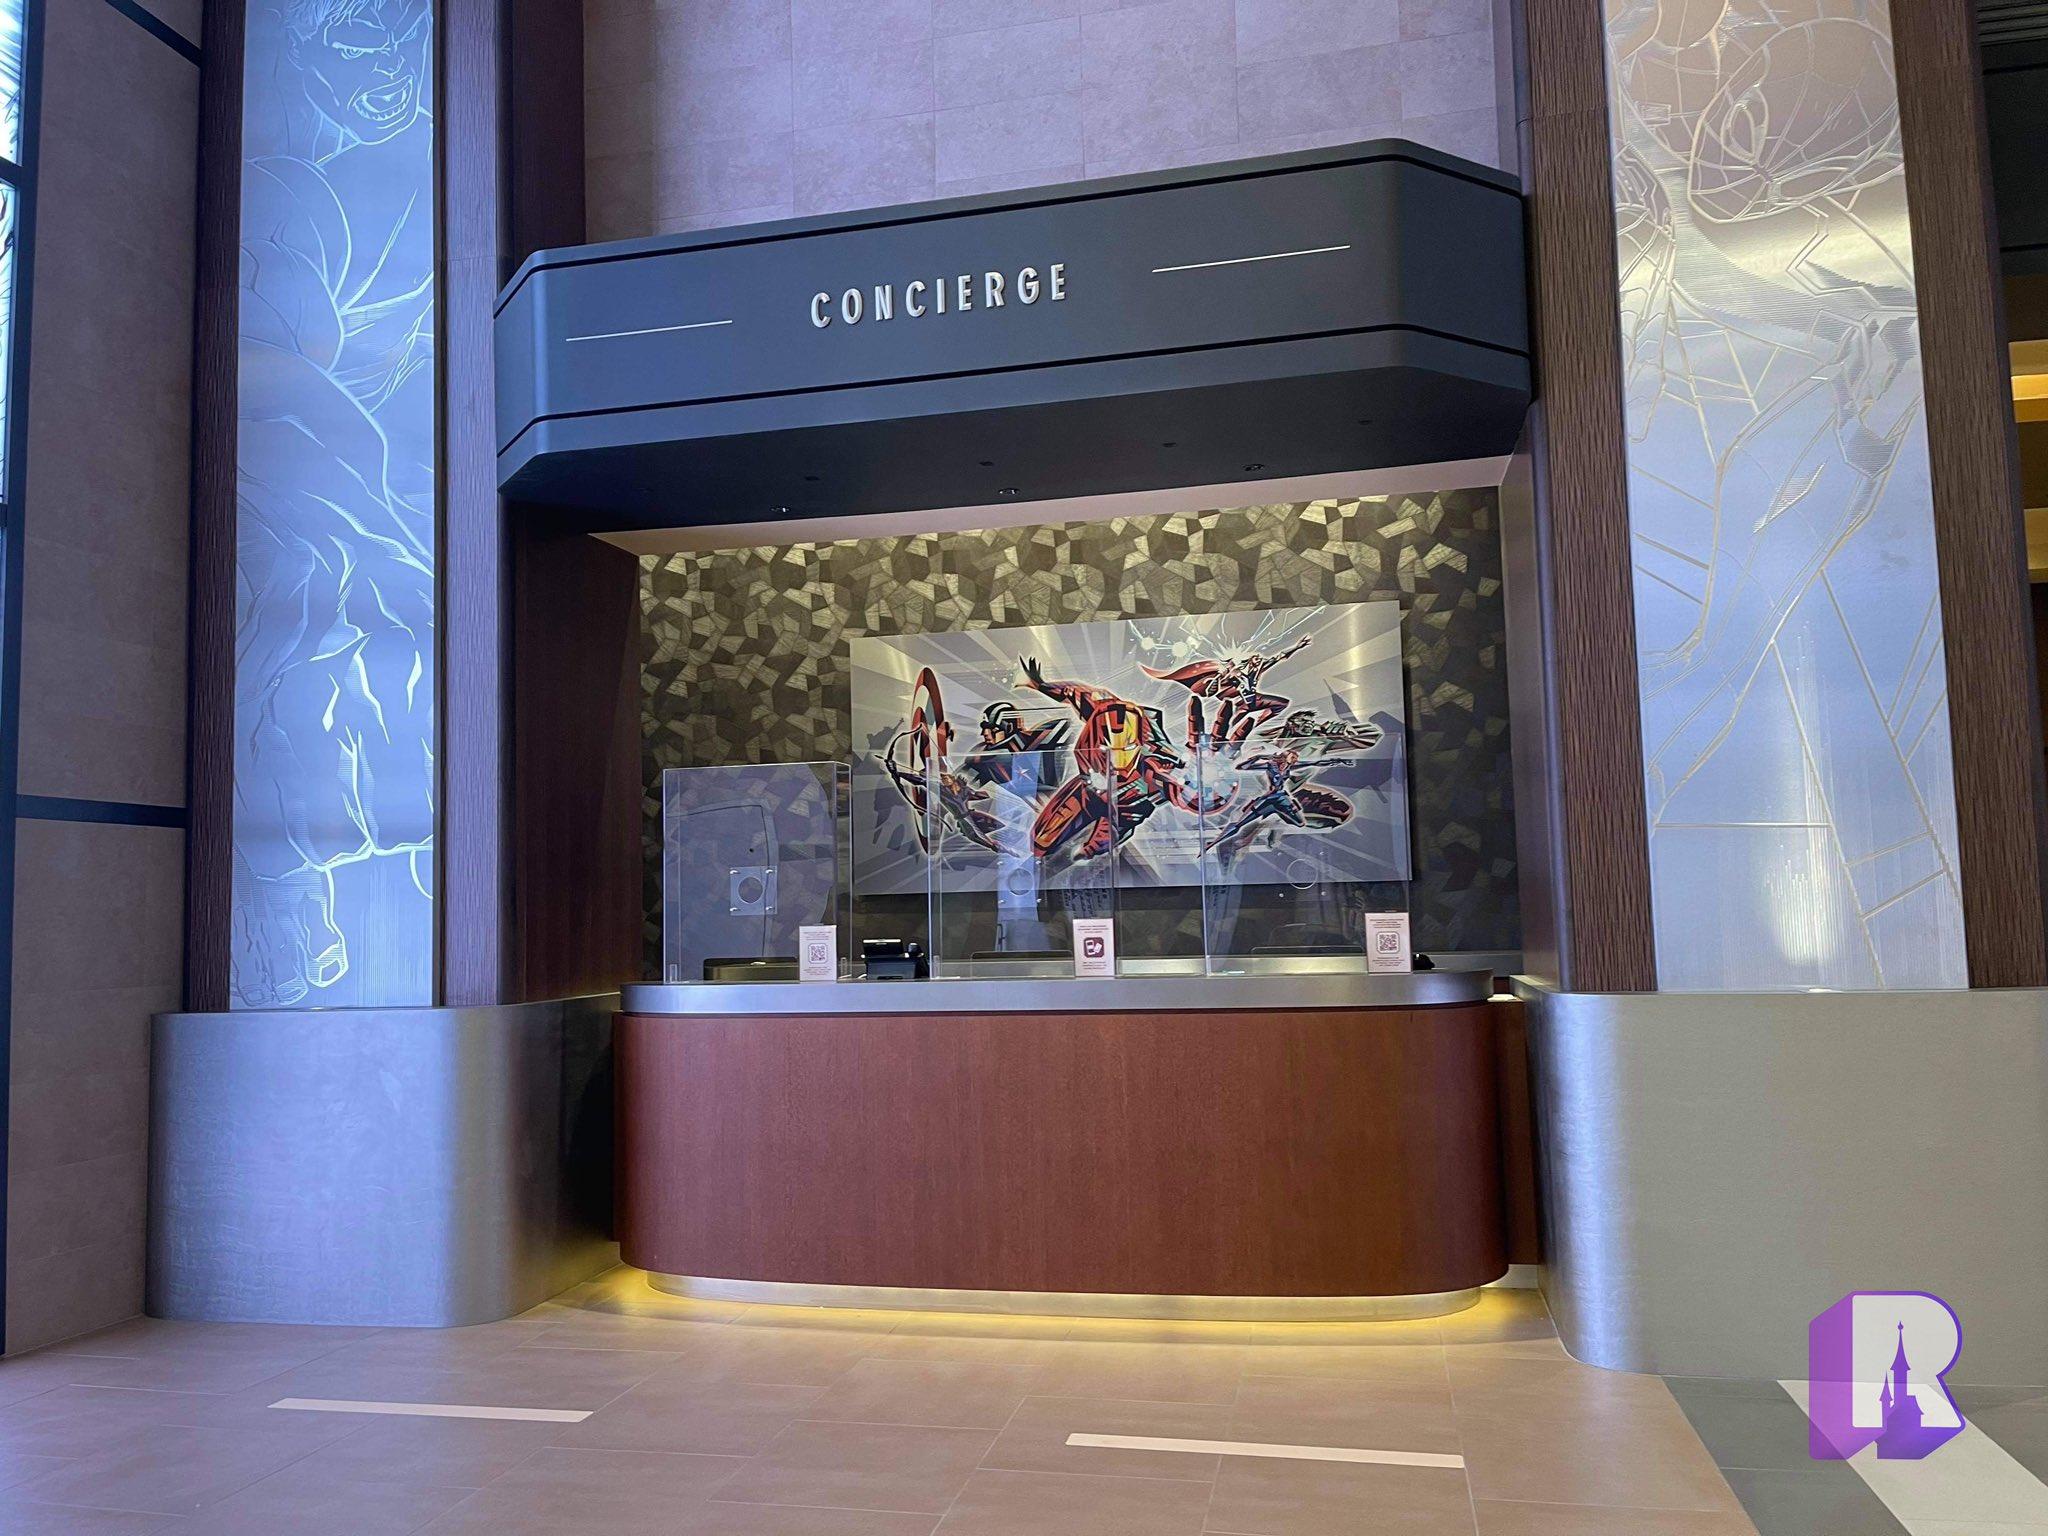 Disney's Hotel New York - The Art of Marvel - Pagina 3 E29wcn10